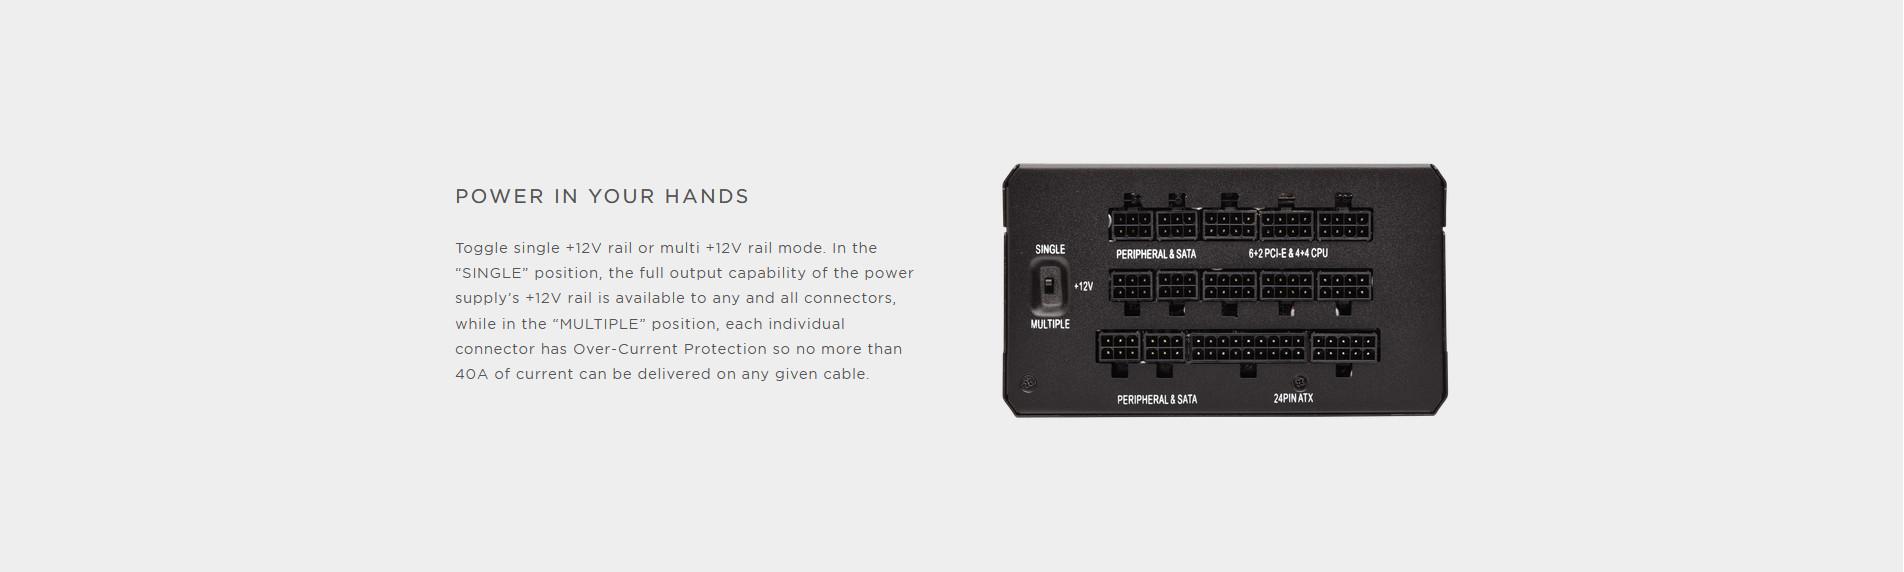 Nguồn Corsair HX1000 1000W (80 Platinum/Màu Đen/Full Modul) giới thiệu 4